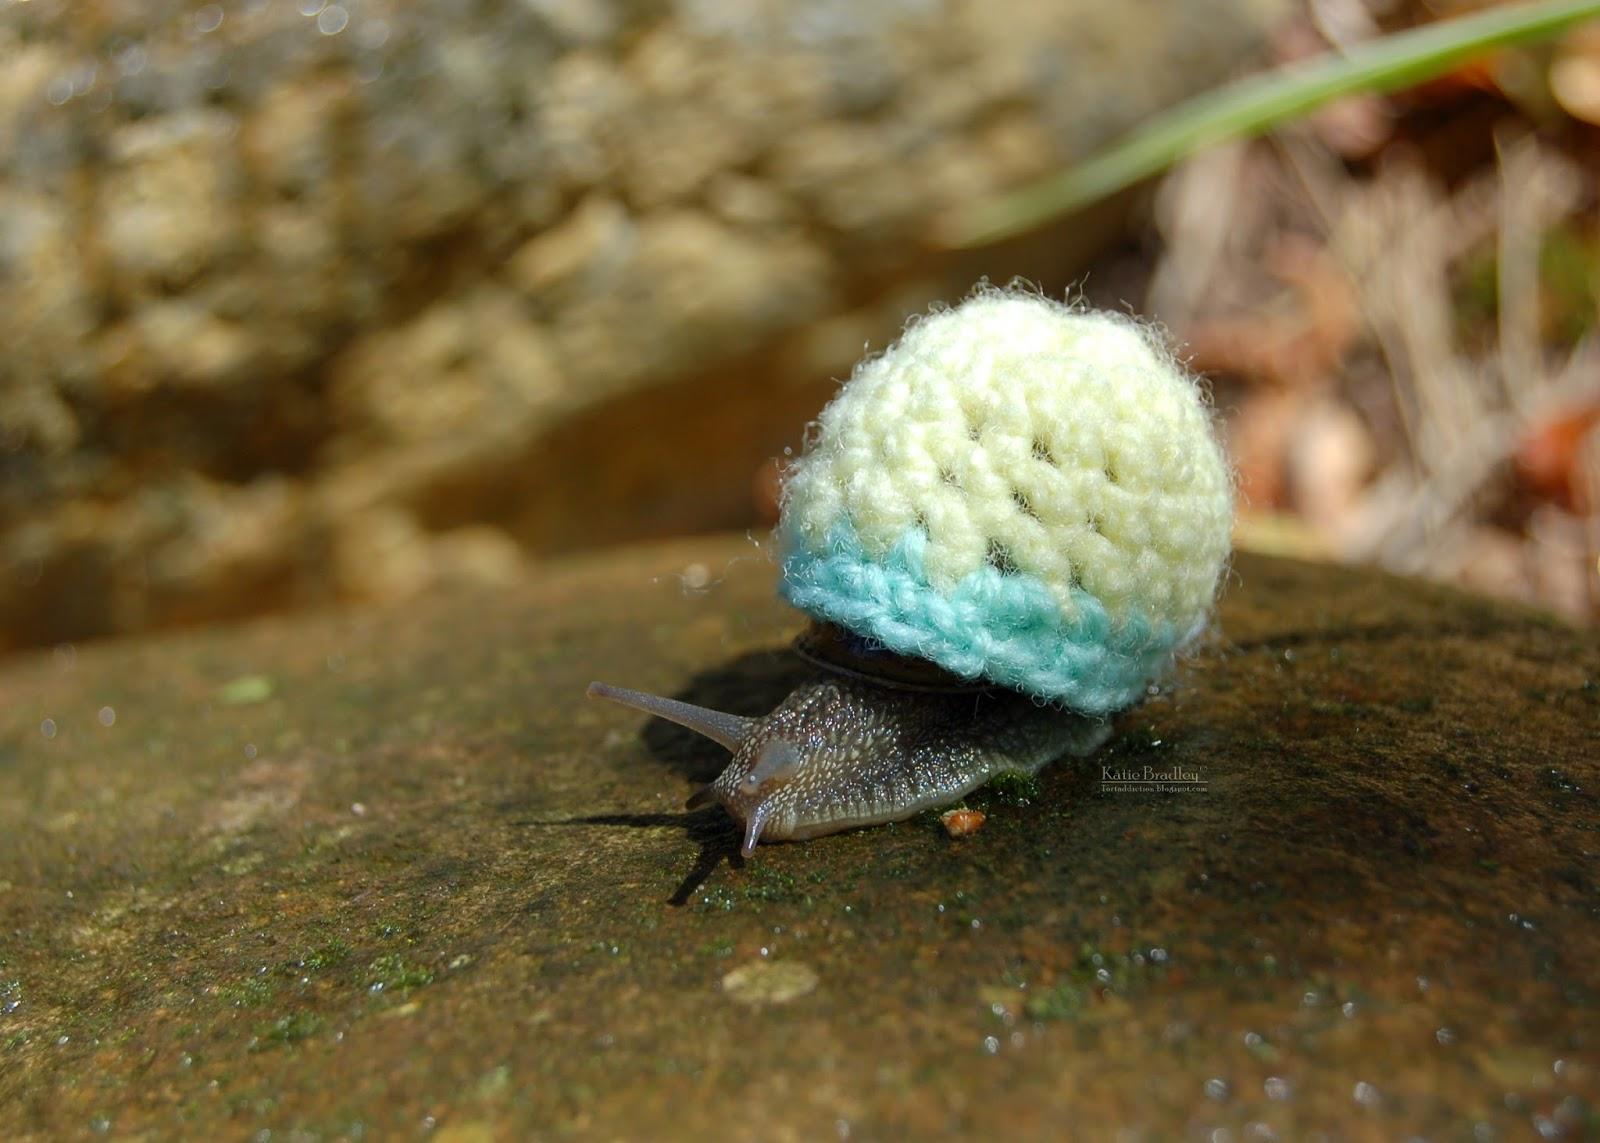 Crocheted Snail Cozy